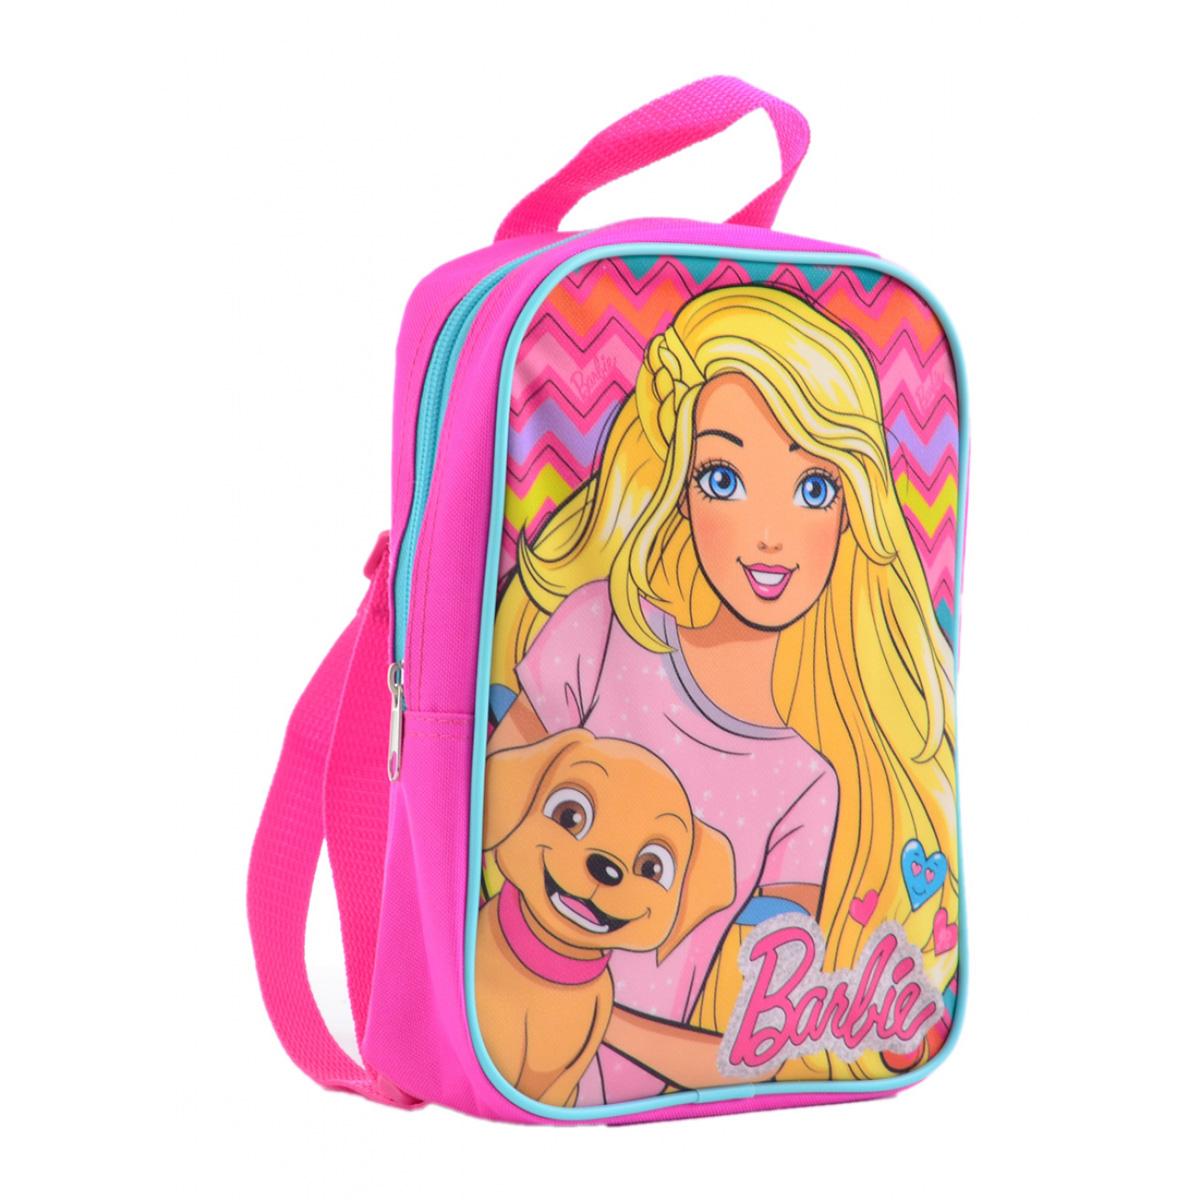 Рюкзак детский K-18 Barbie, 24.5*17*6